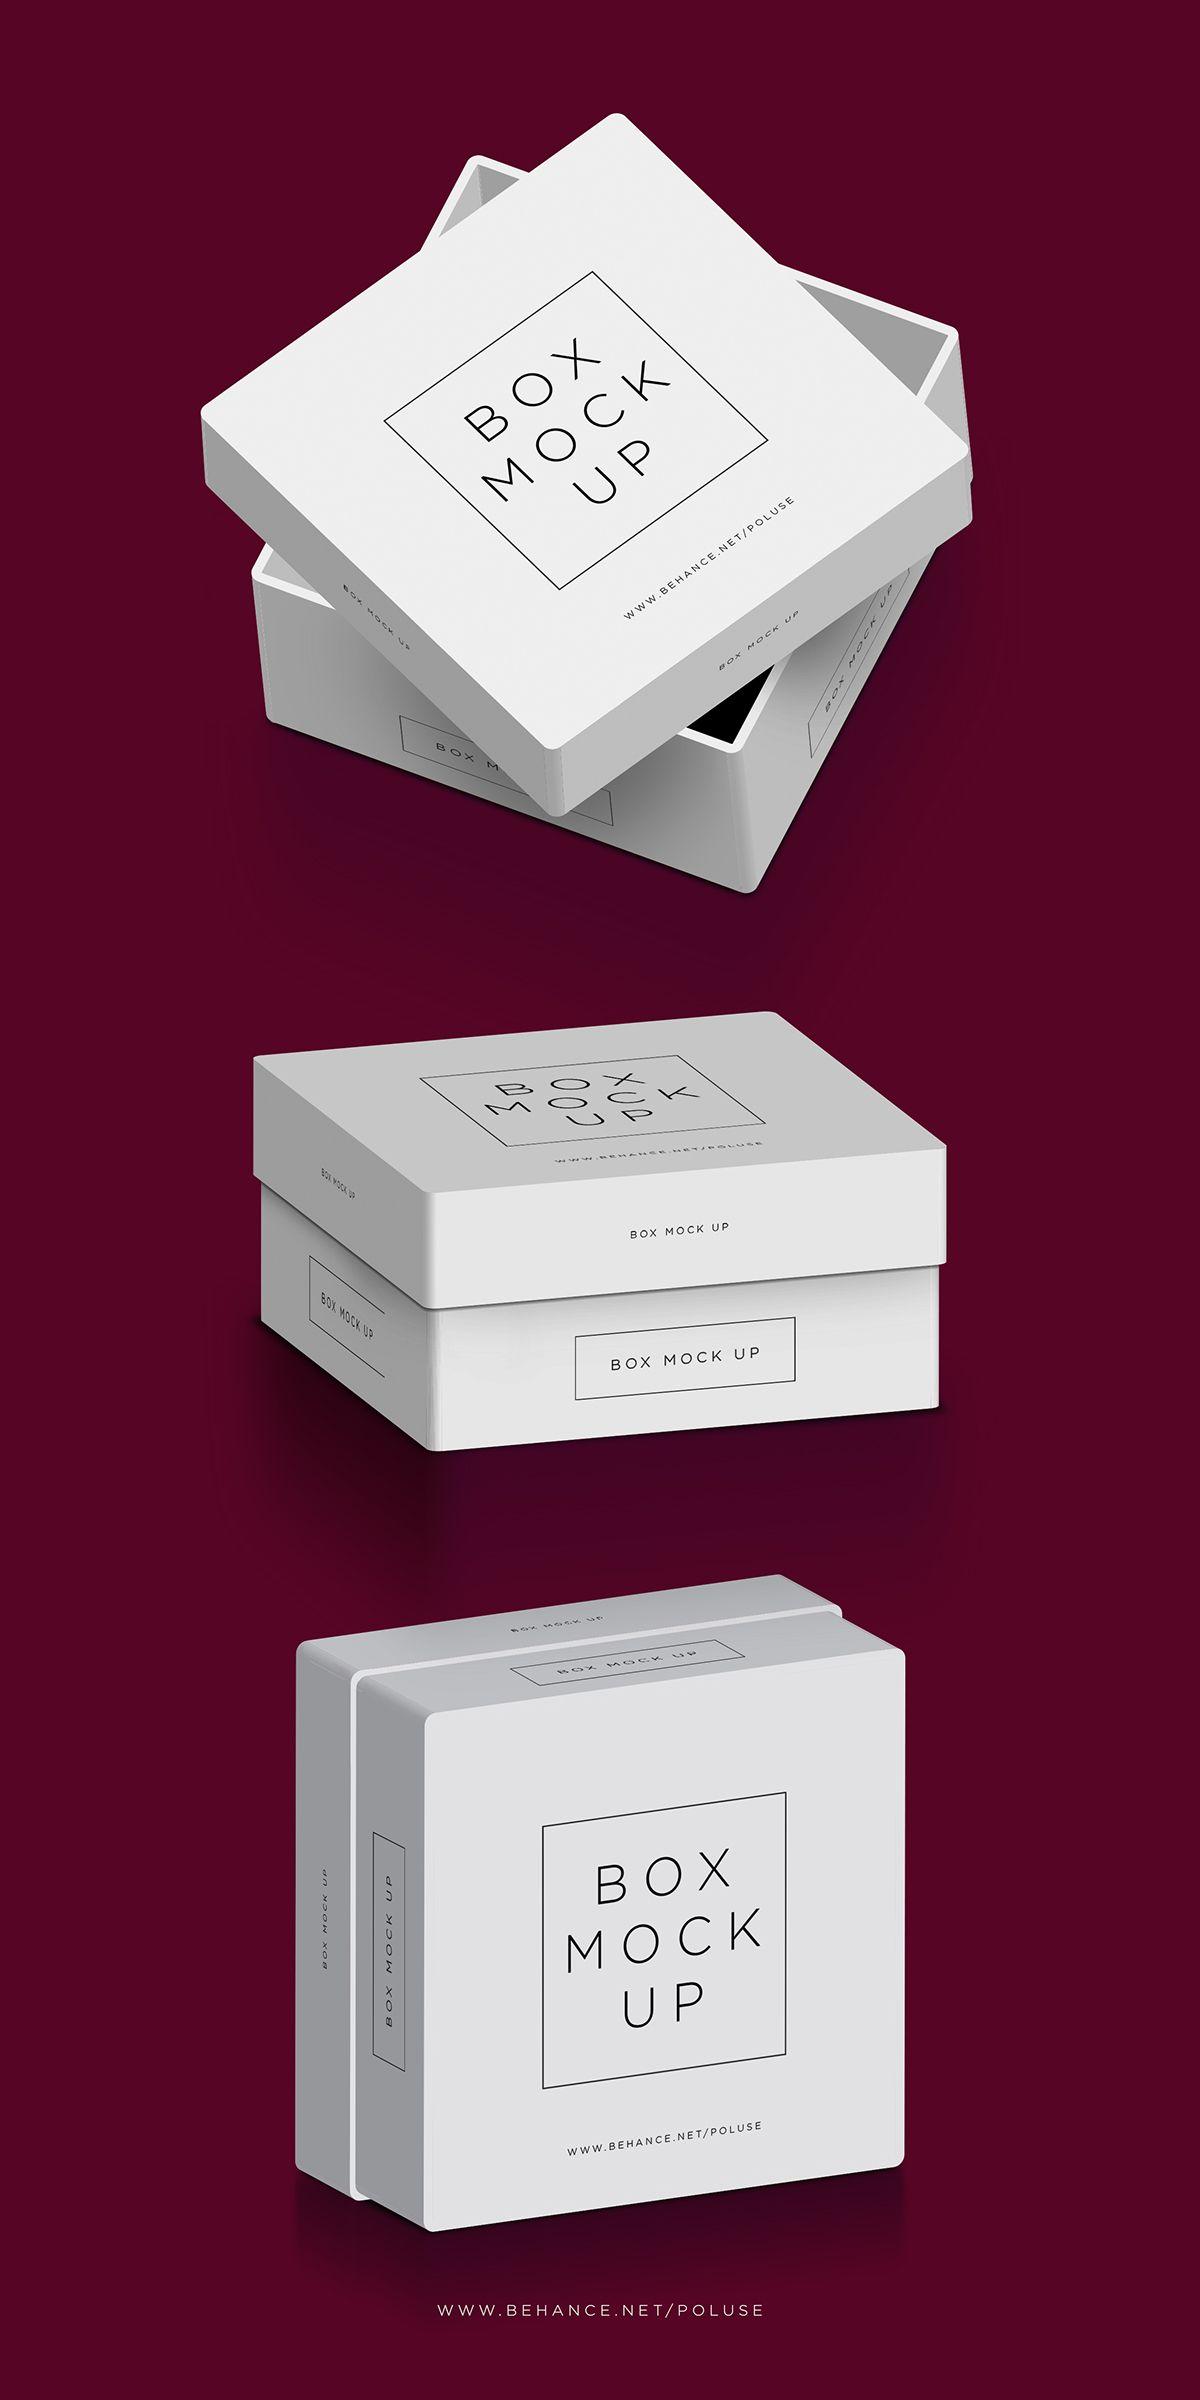 Download Square Box Free Mockup Pinspiry Design Mockup Free Free Packaging Mockup Box Mockup